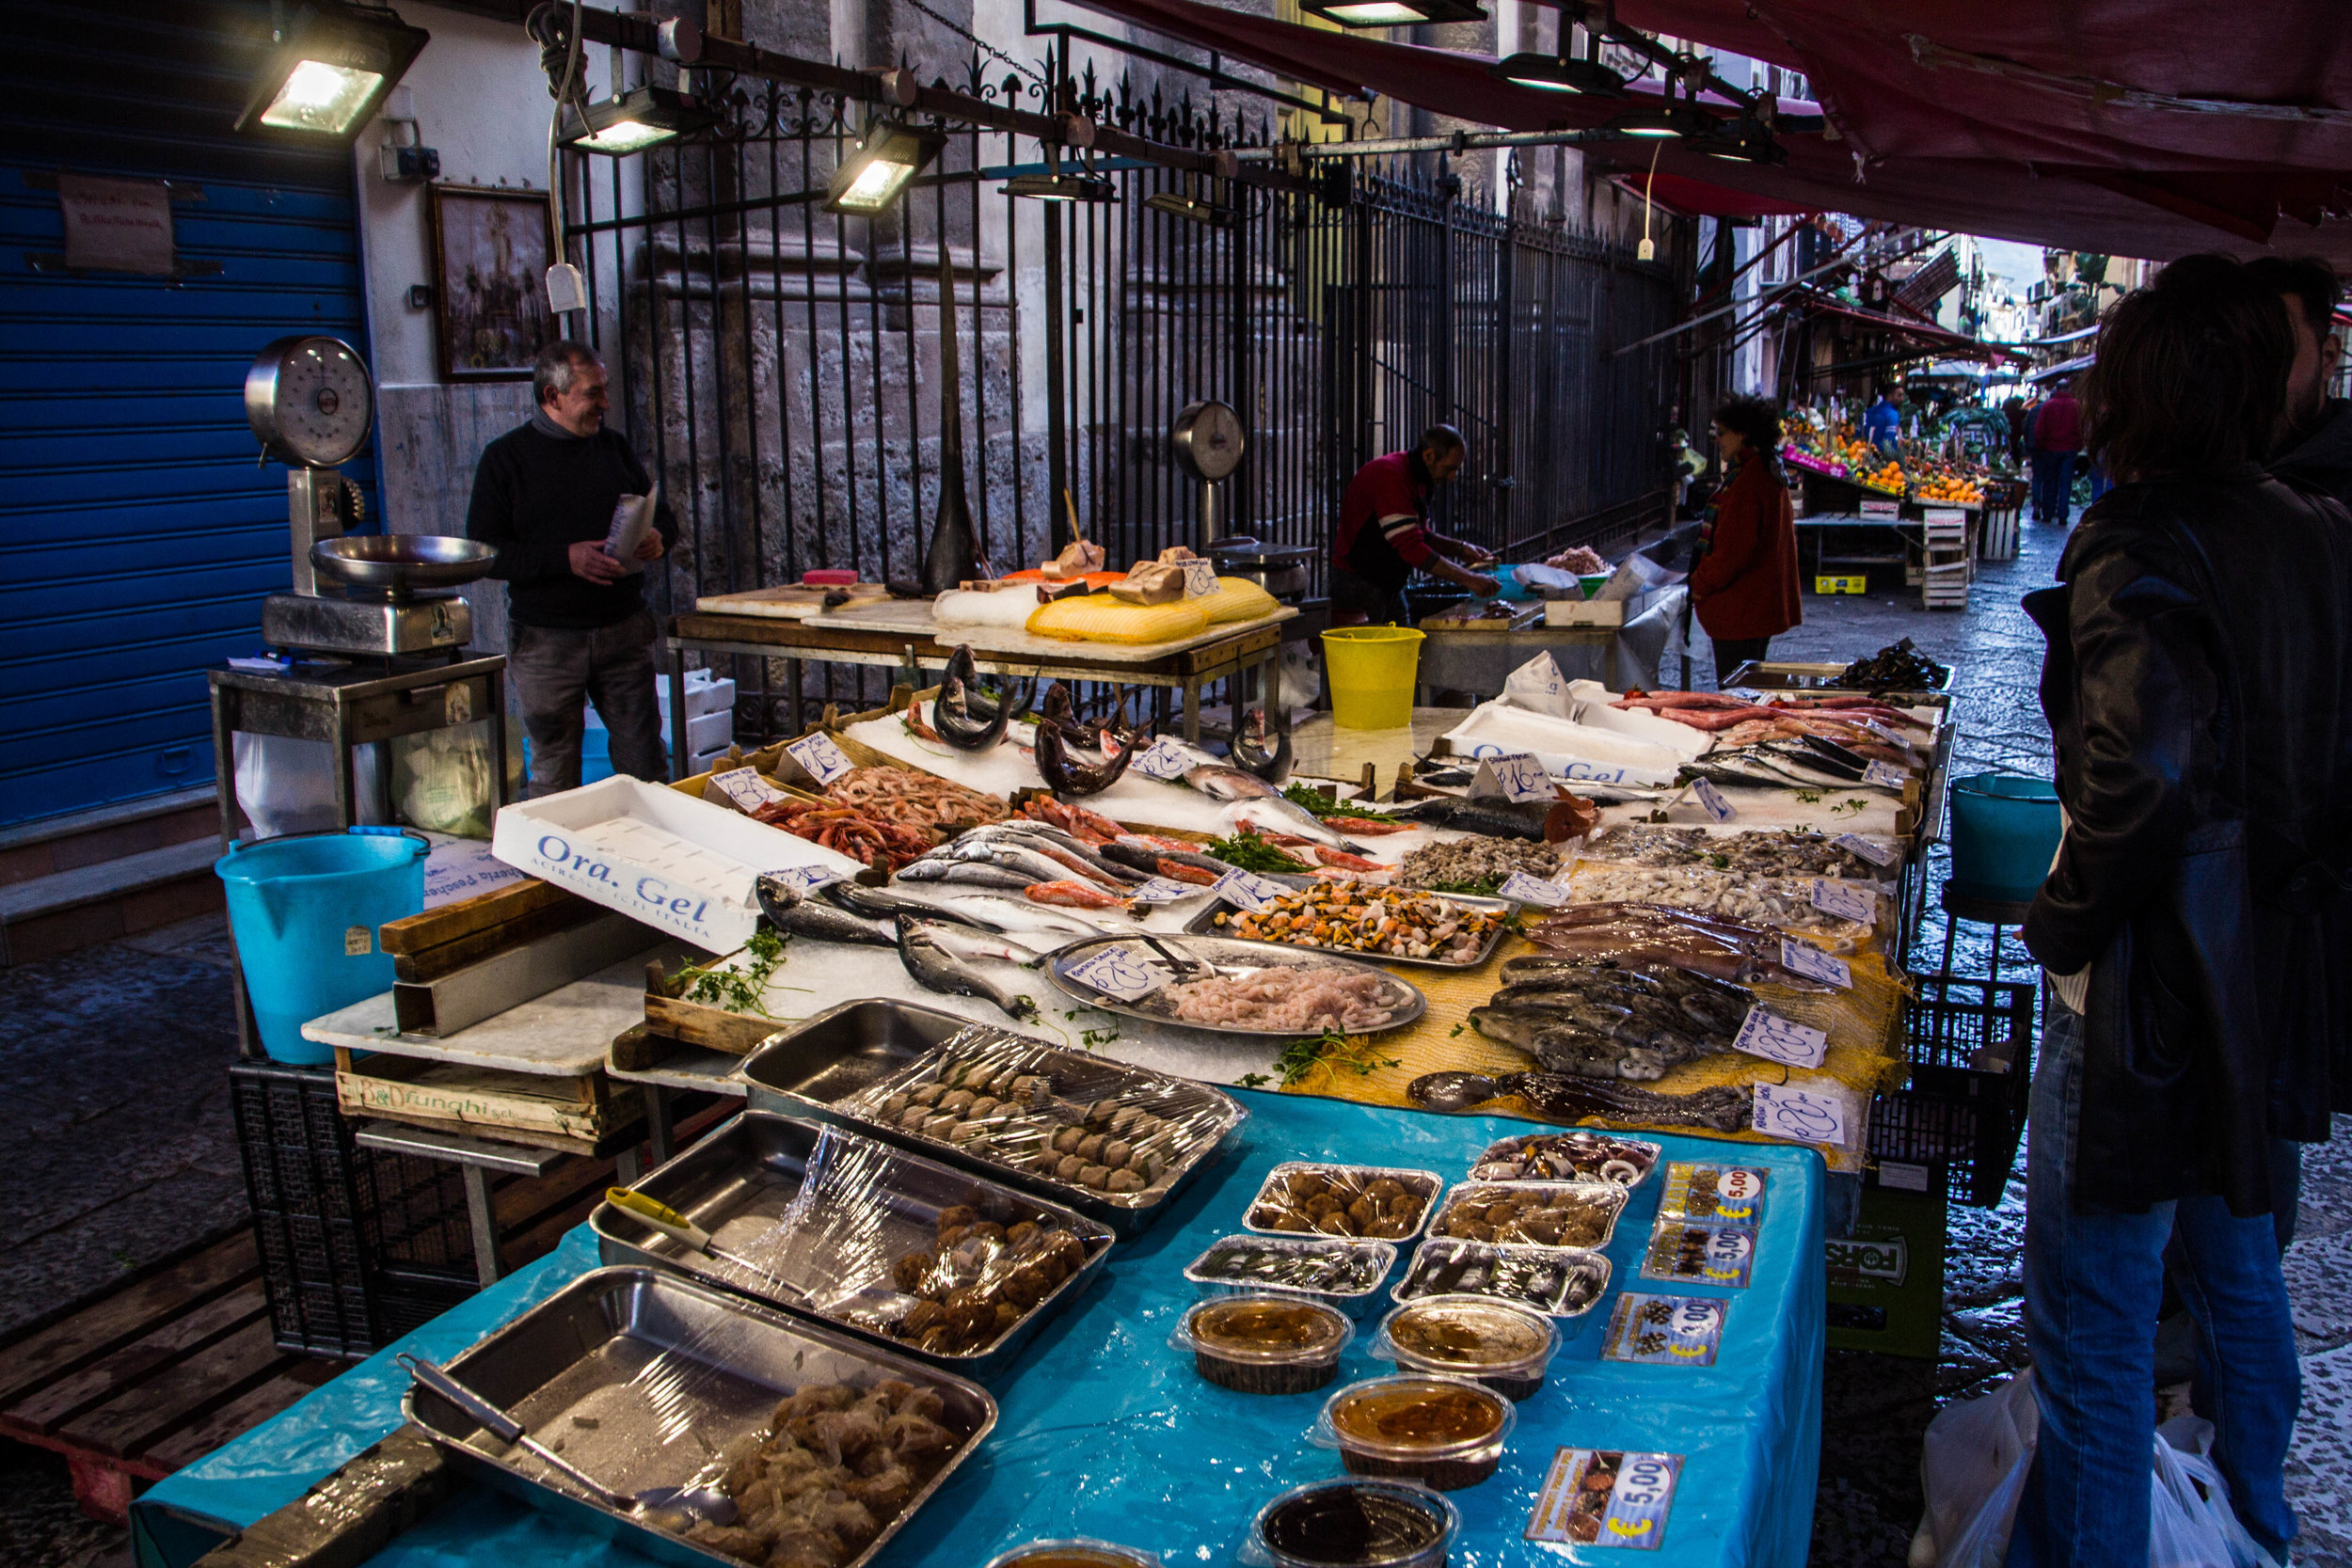 street-markets-palermo-sicily-8.jpg